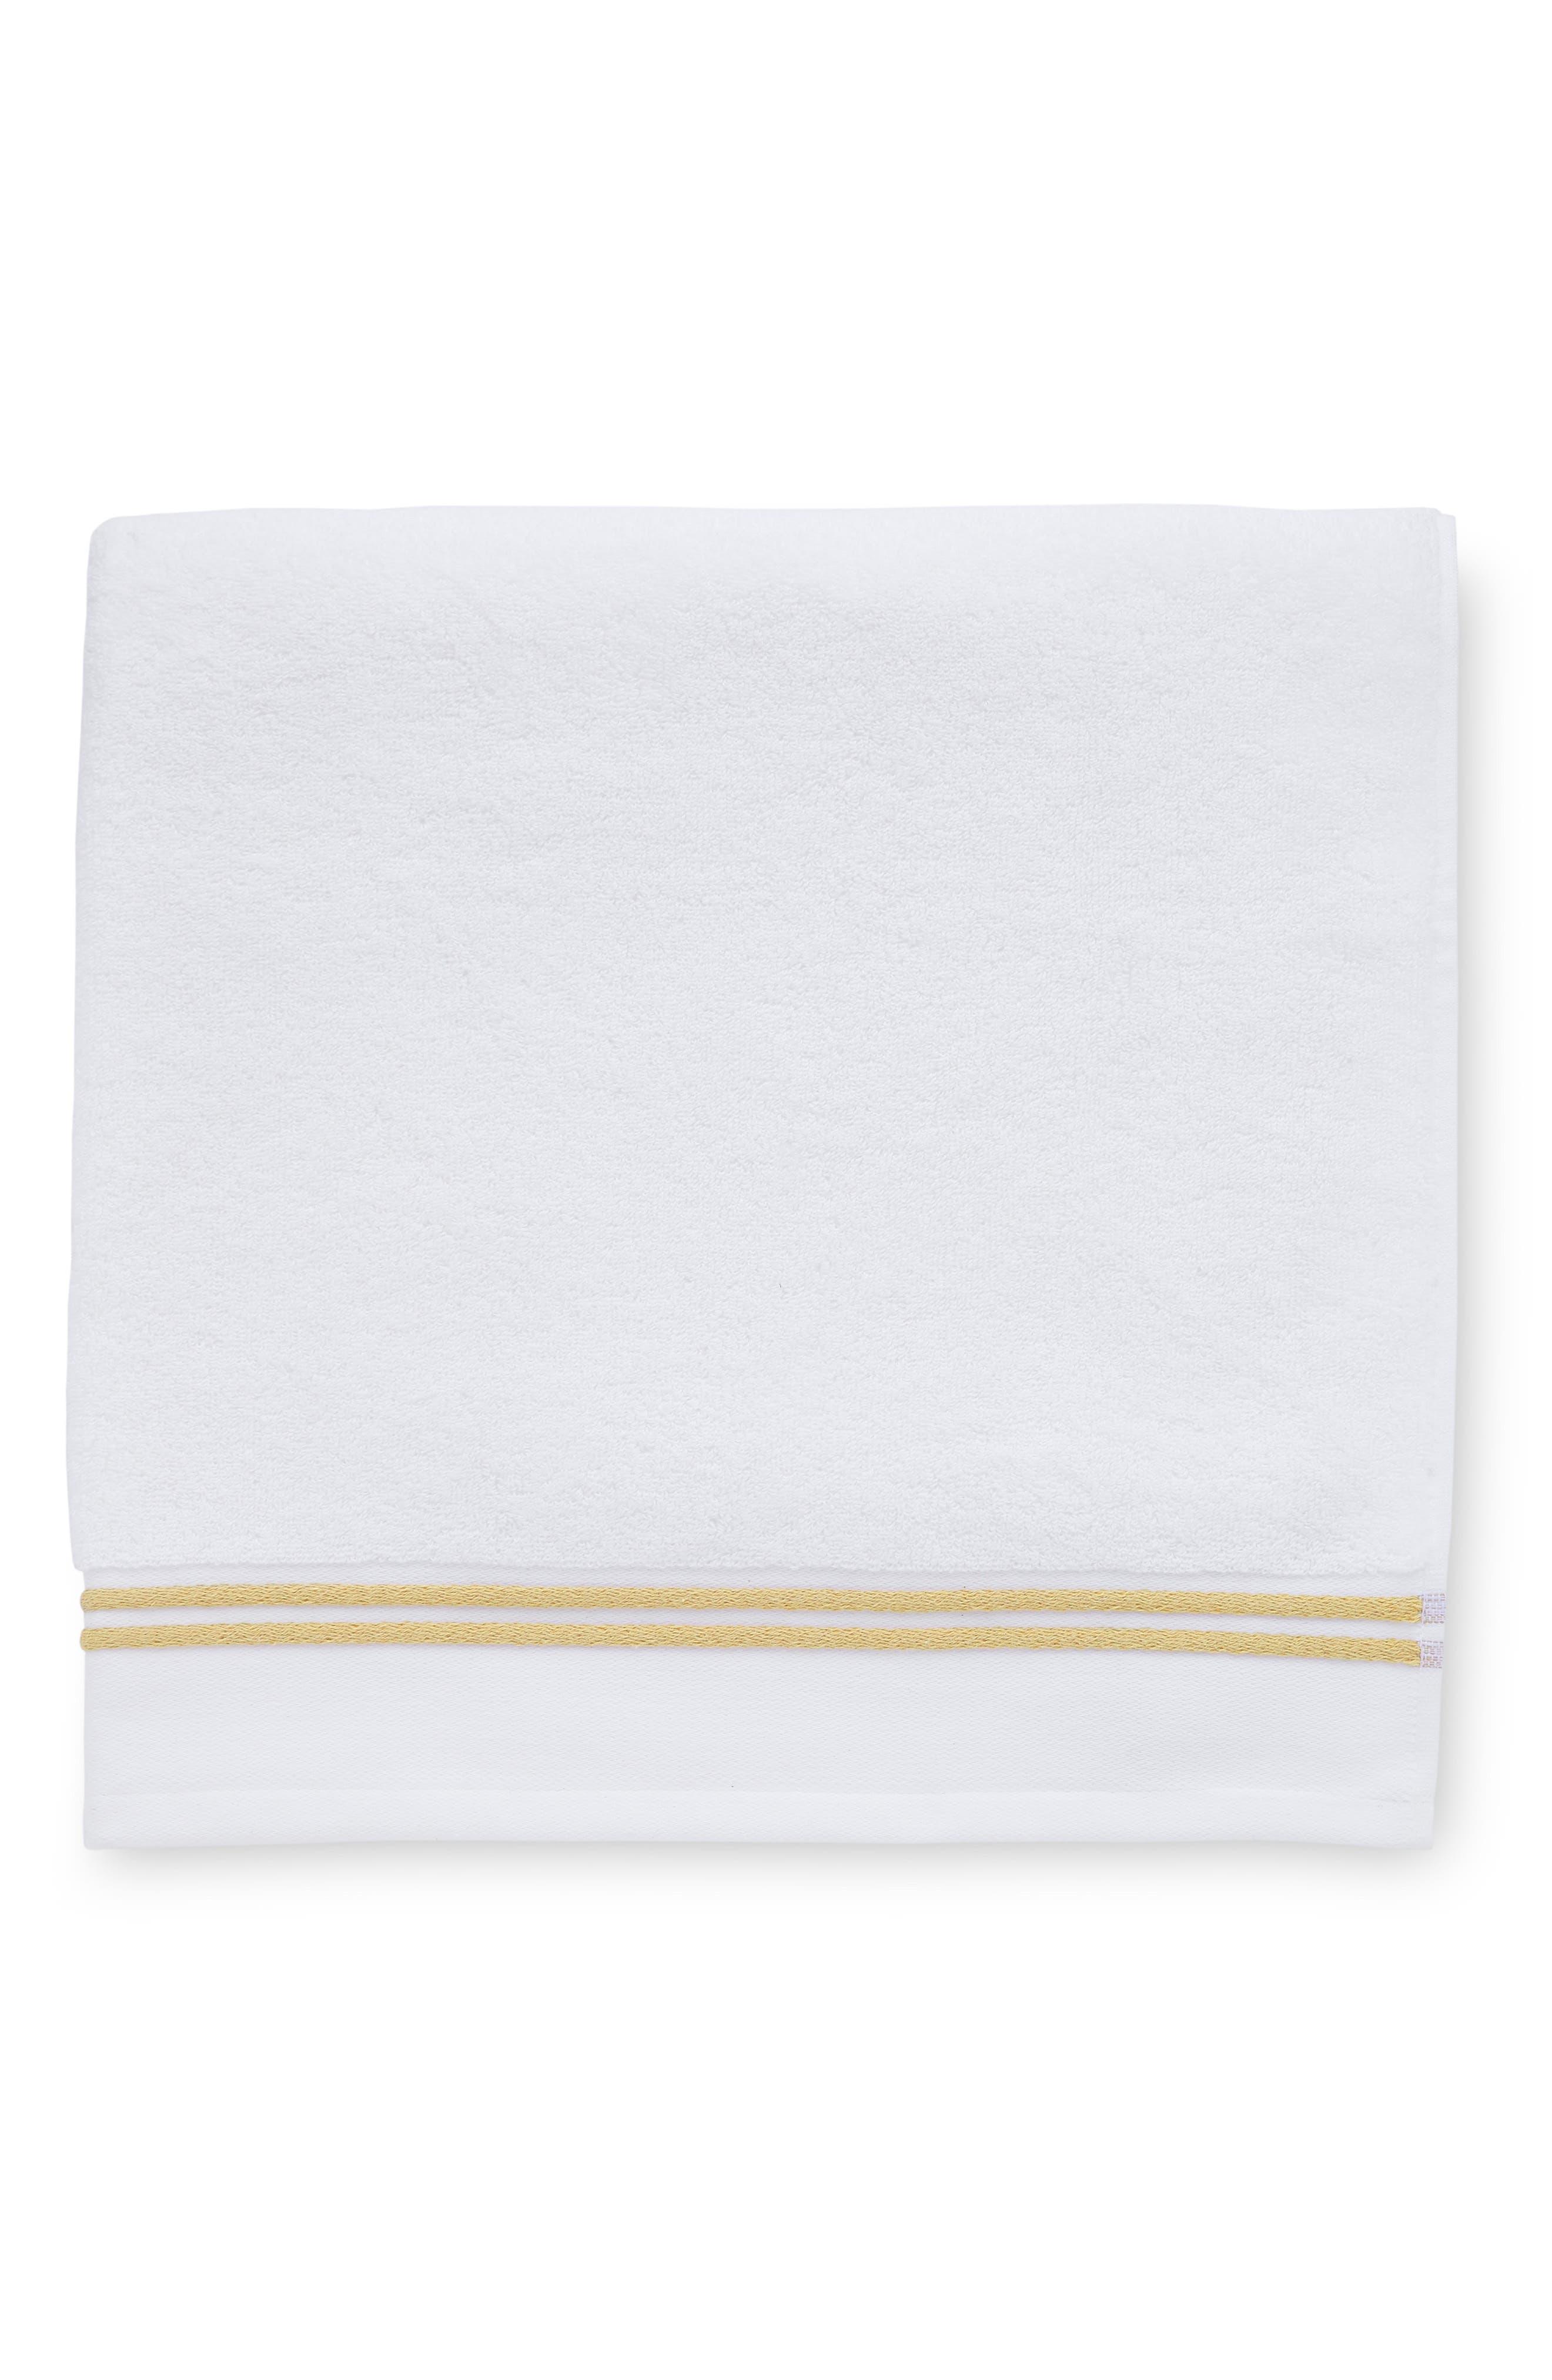 SFERRA Aura Bath Towel, Main, color, WHITE/CORN